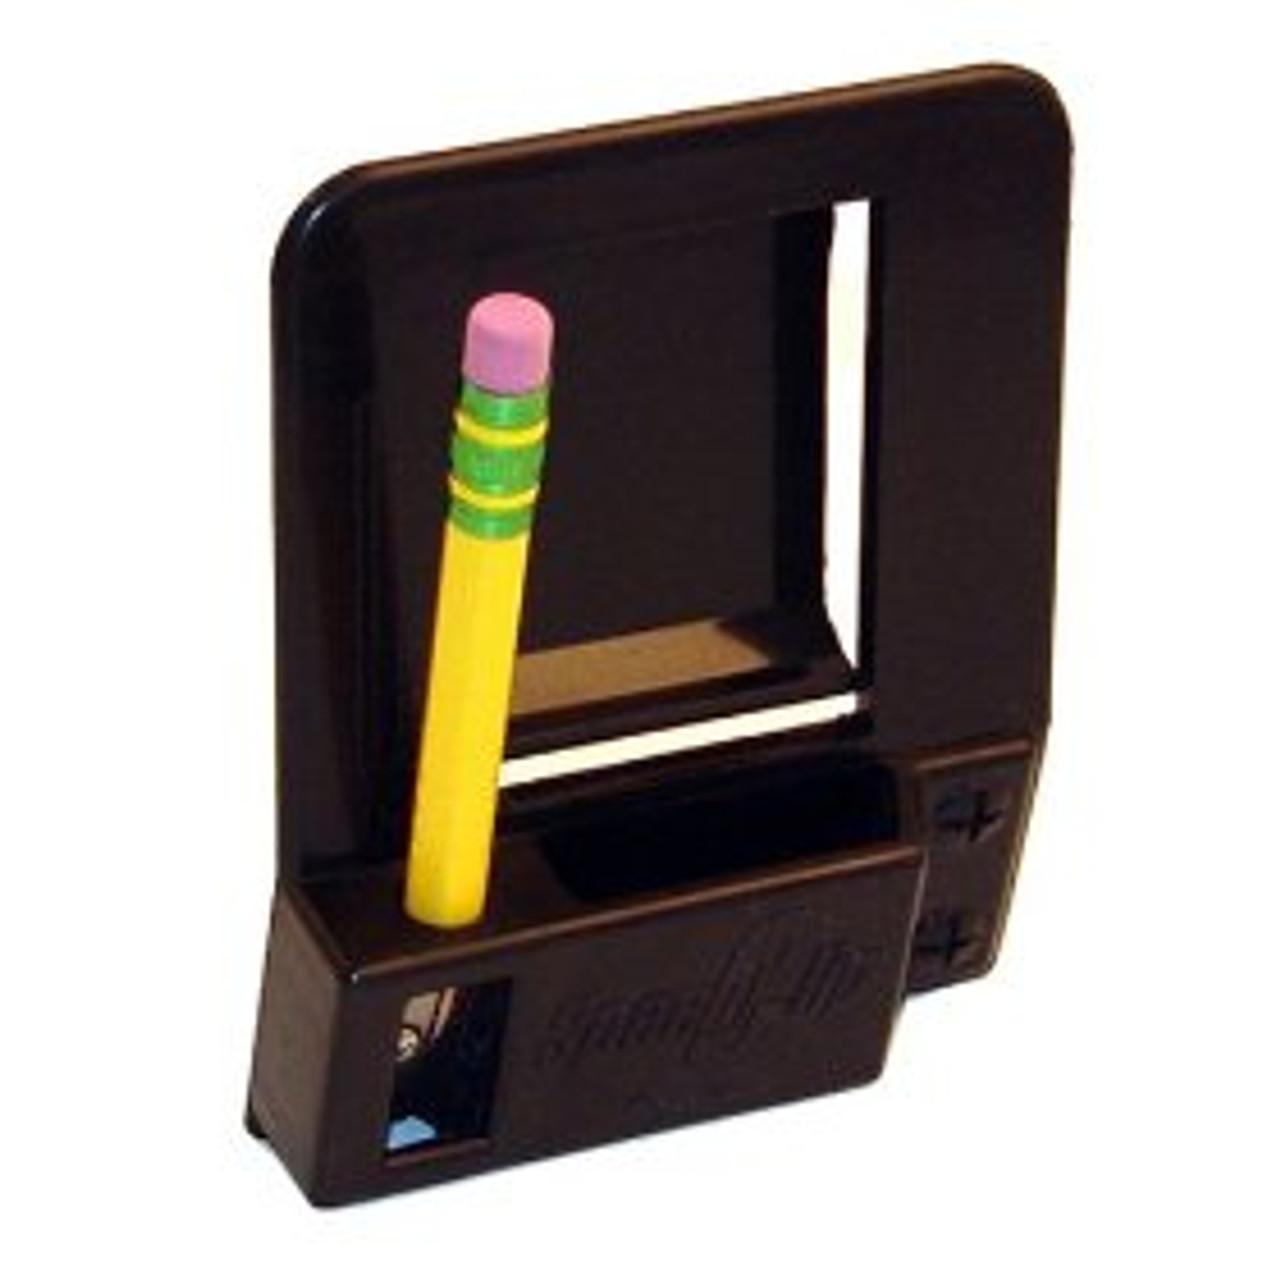 Speed Clip Tape Measure/Any Belt Clip Holder & pencil sharpener